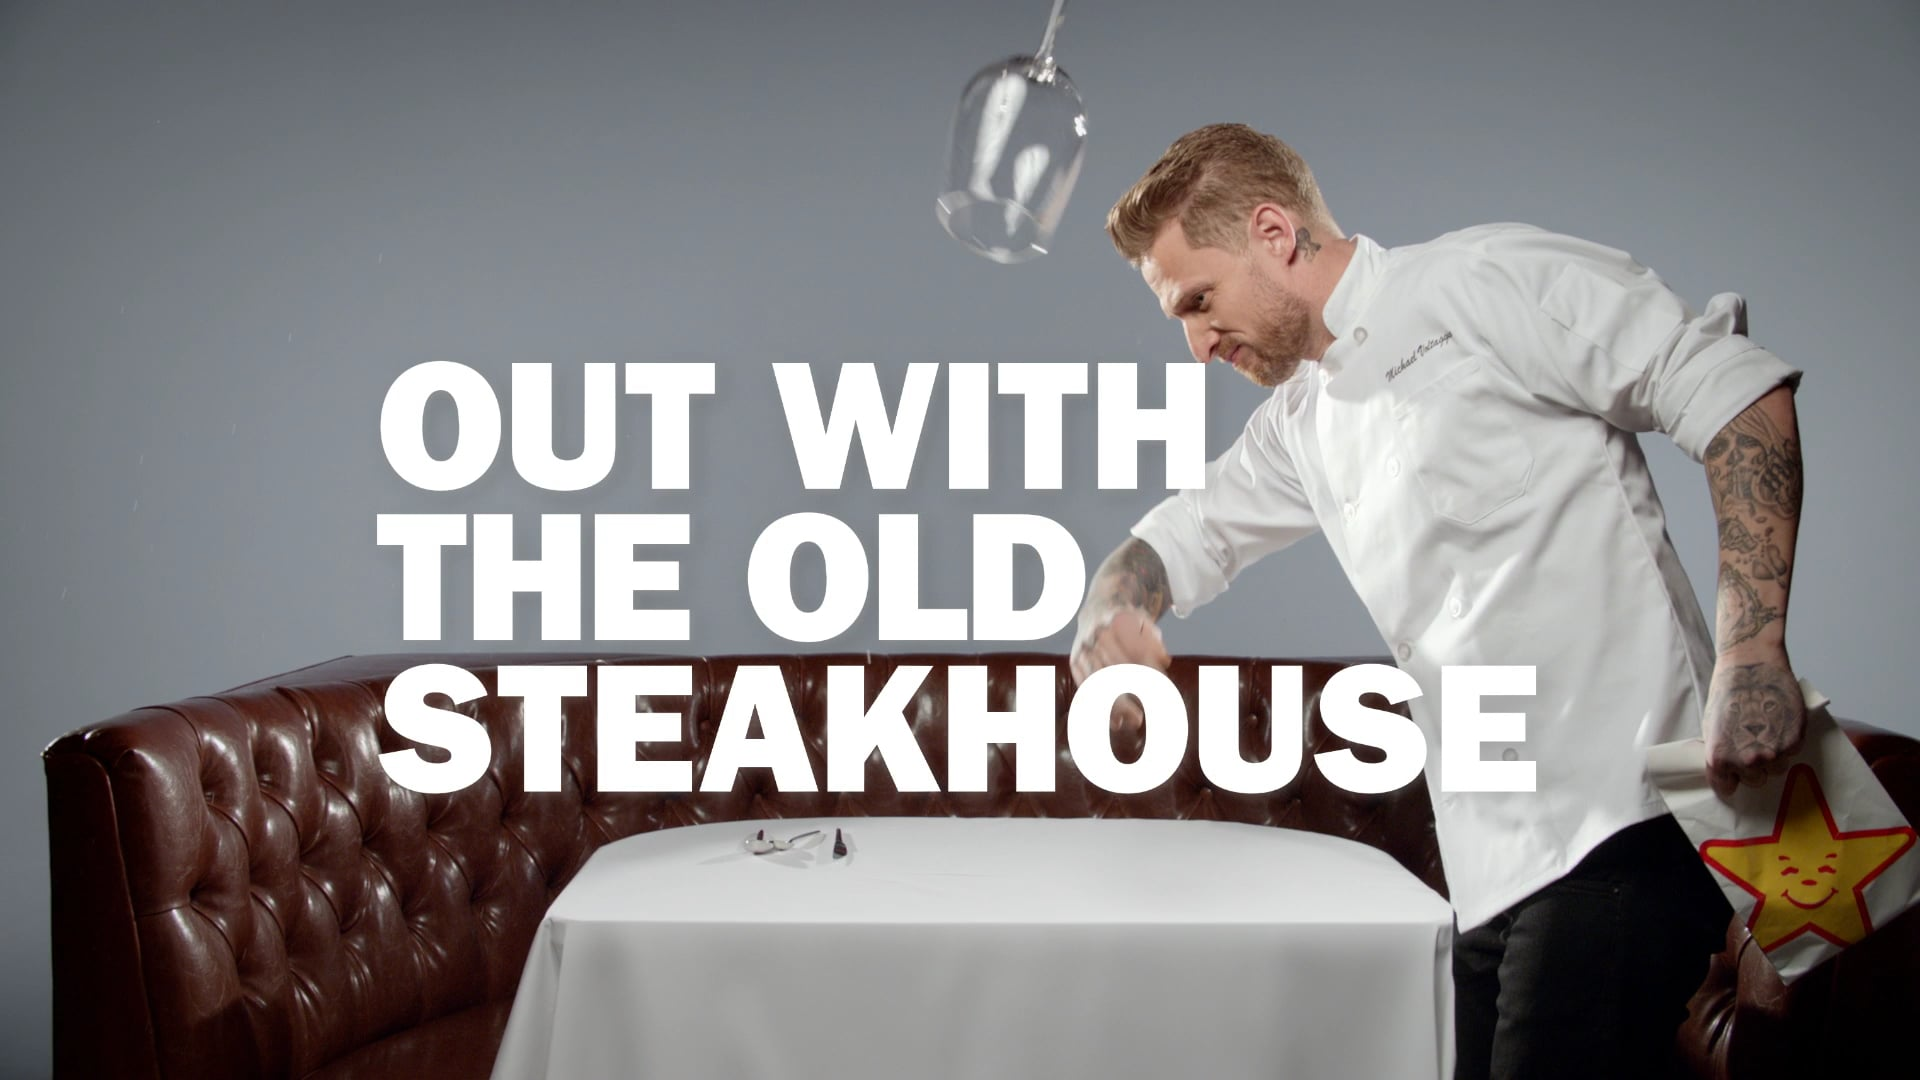 HUNGER - Voltaggio - Steakhouse - Carl's Jr. - Hardee's - :30